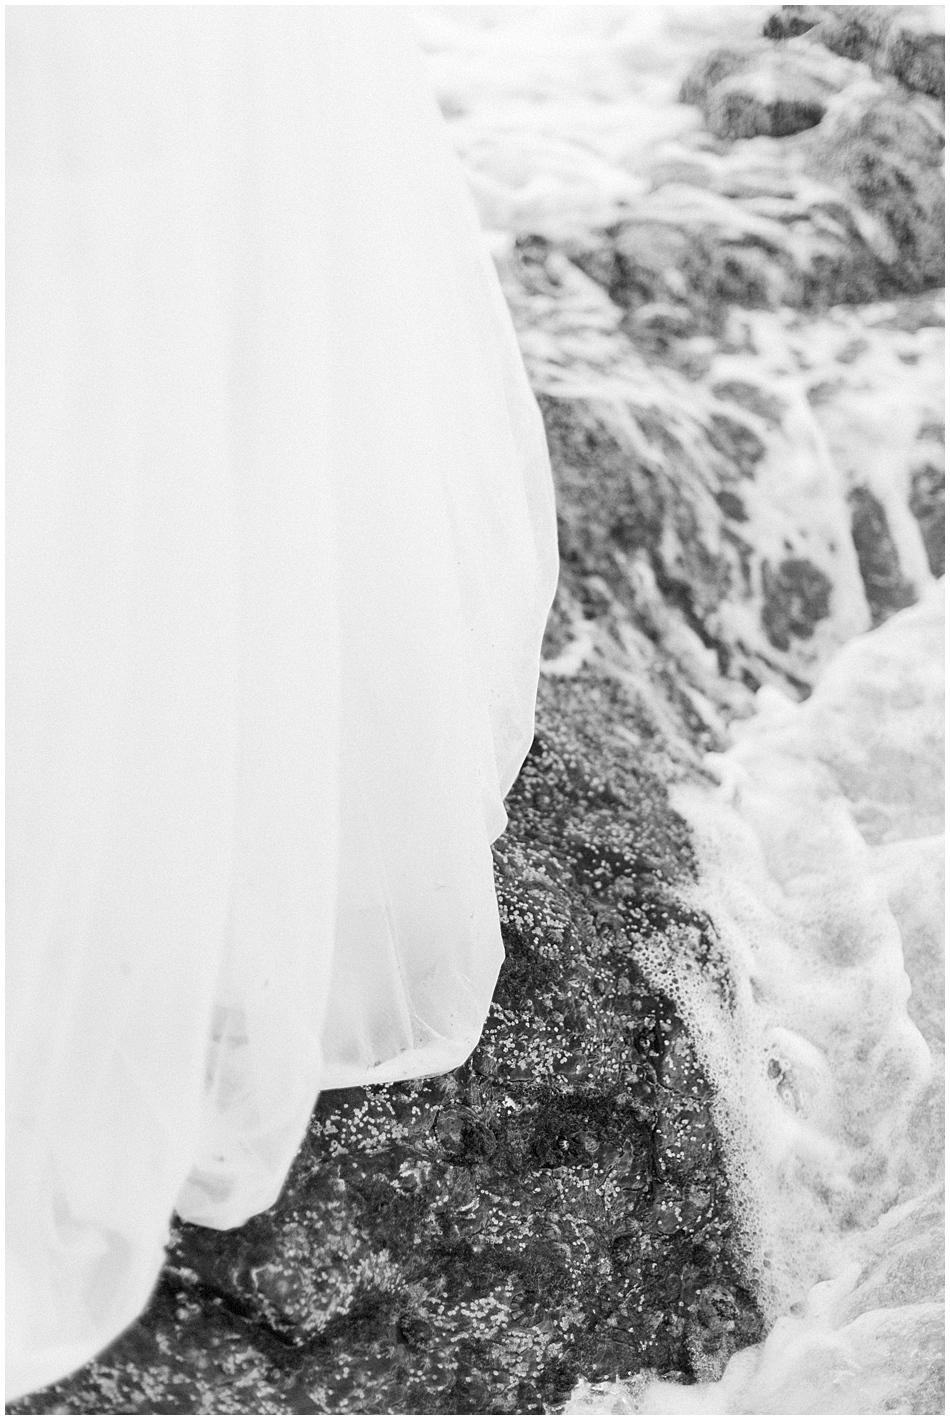 Marie-Alice G-Photographe Mariage France Normandie - Photographe Mariage Manche valognes cherbourg - Wedding Photographer France_0166